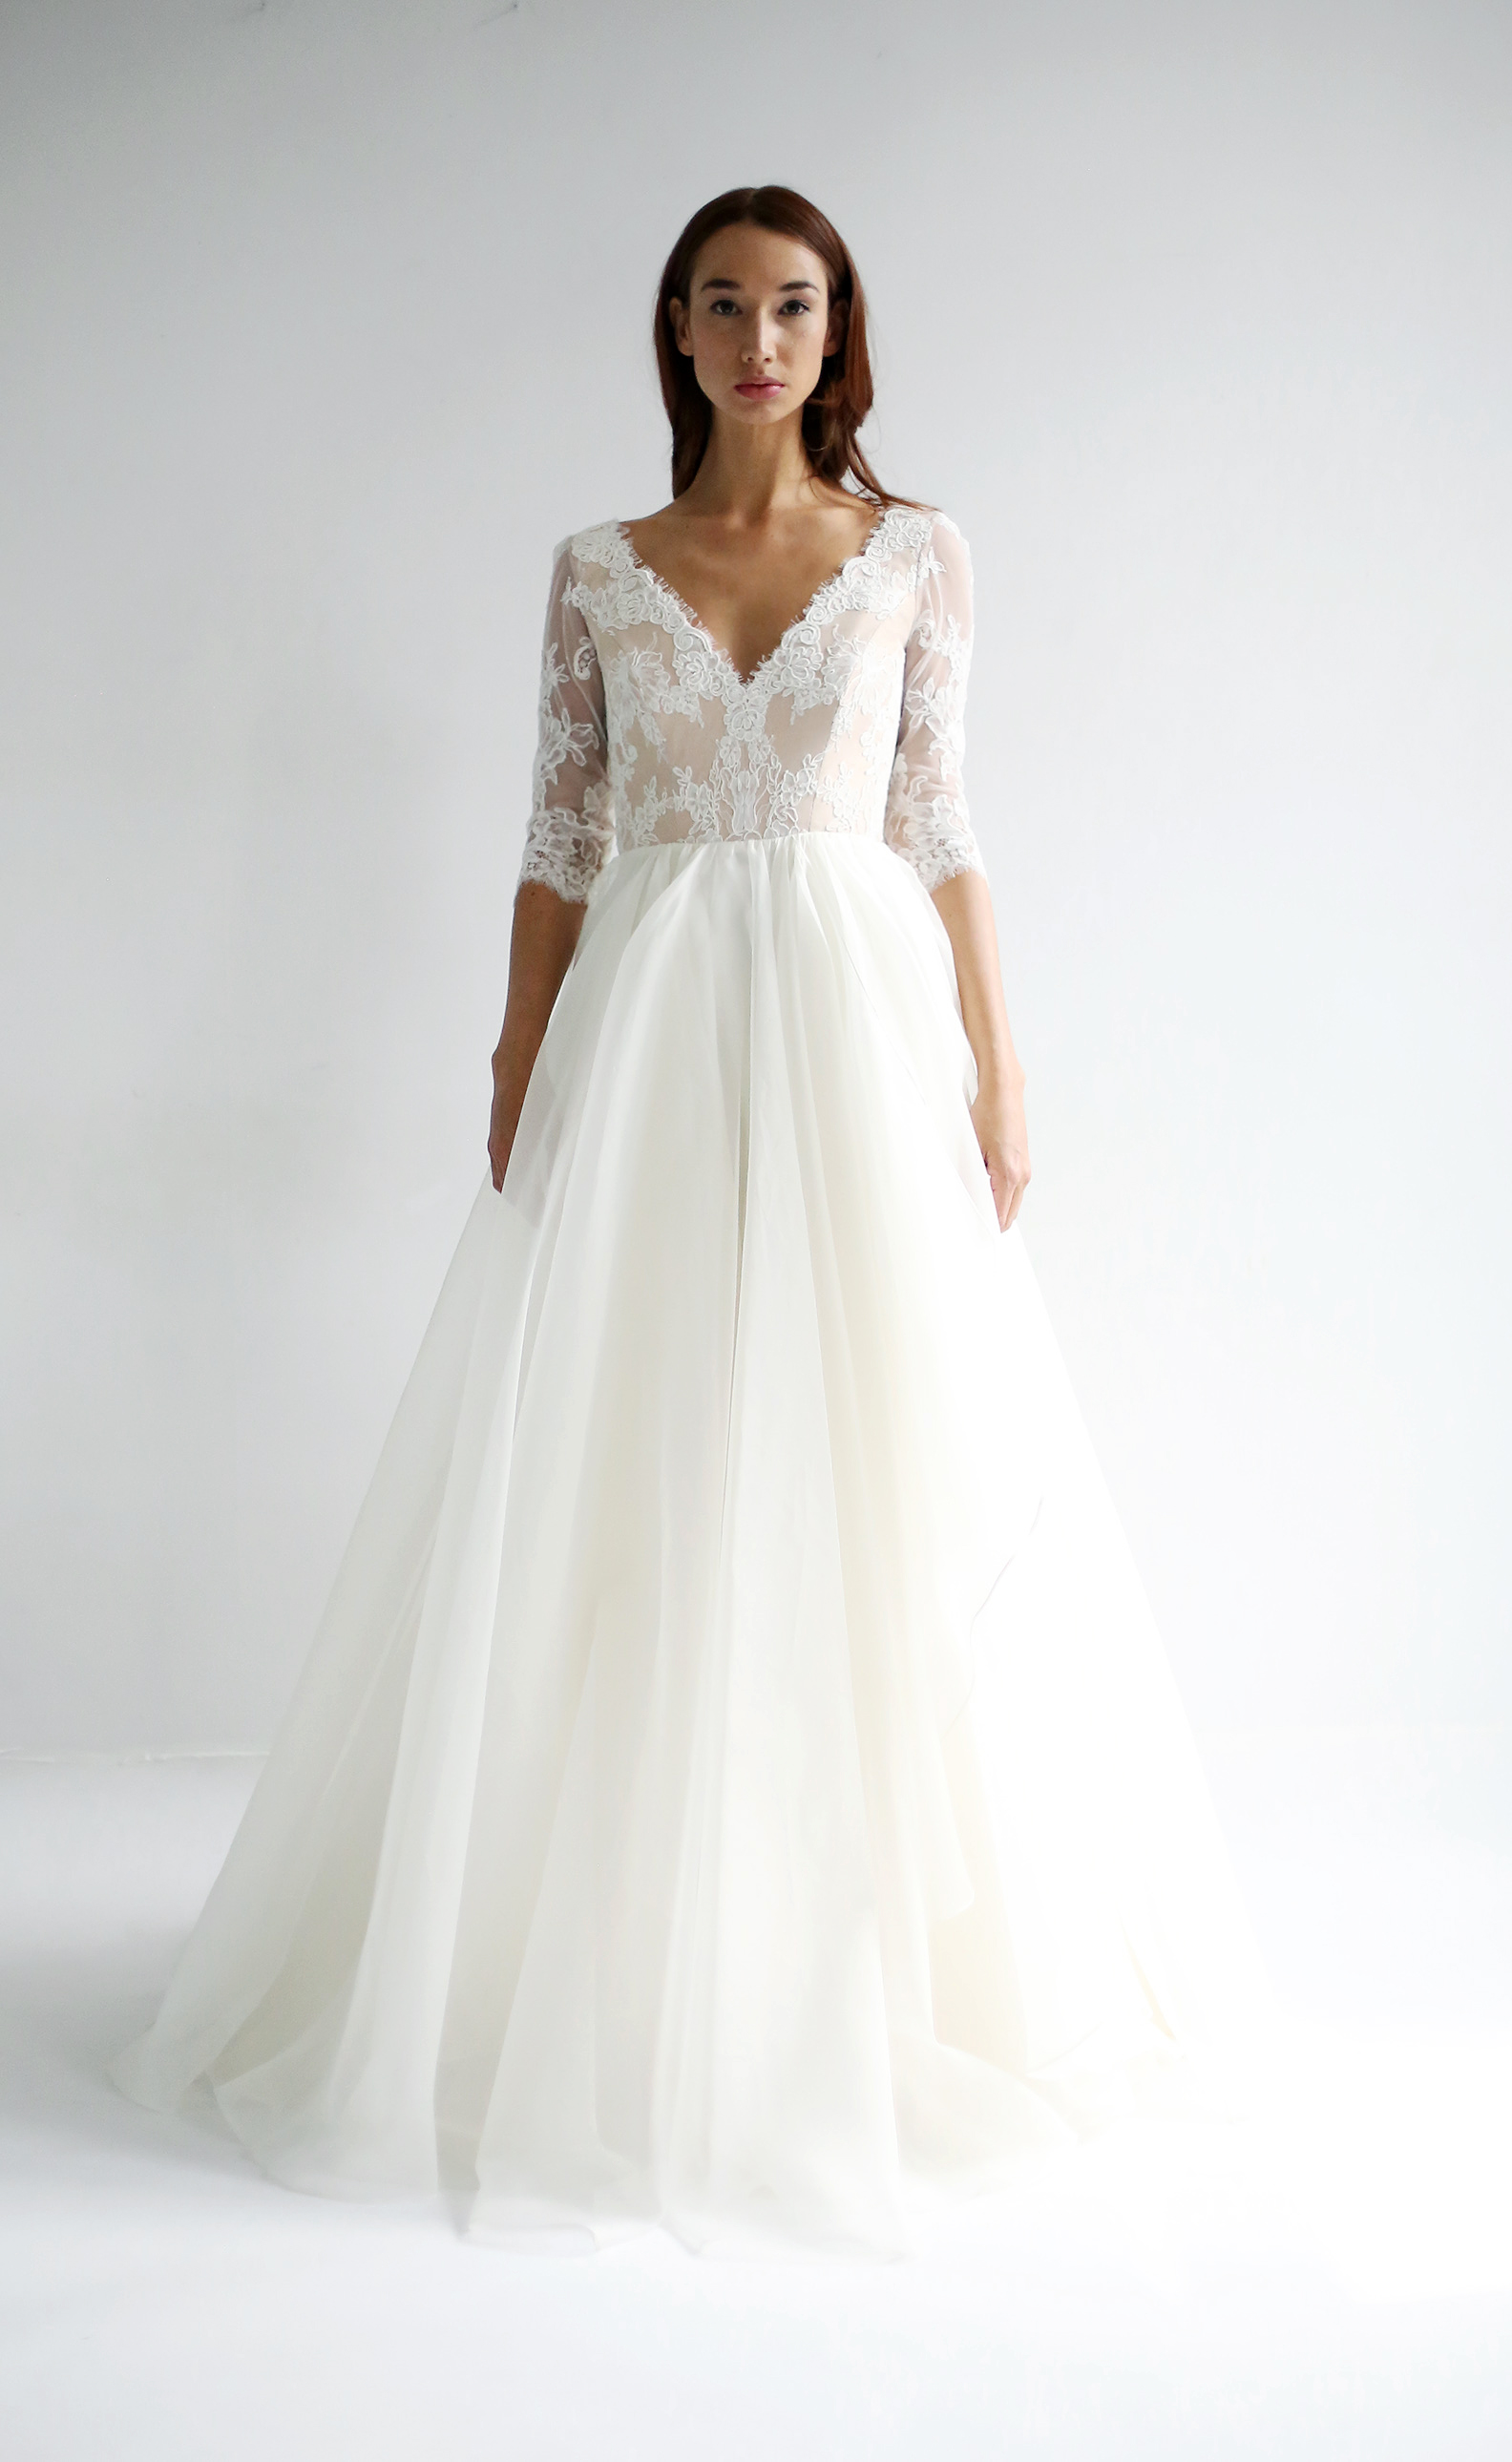 leanne marshall wedding dress spring 2019 lace elbow length sleeves v-neck